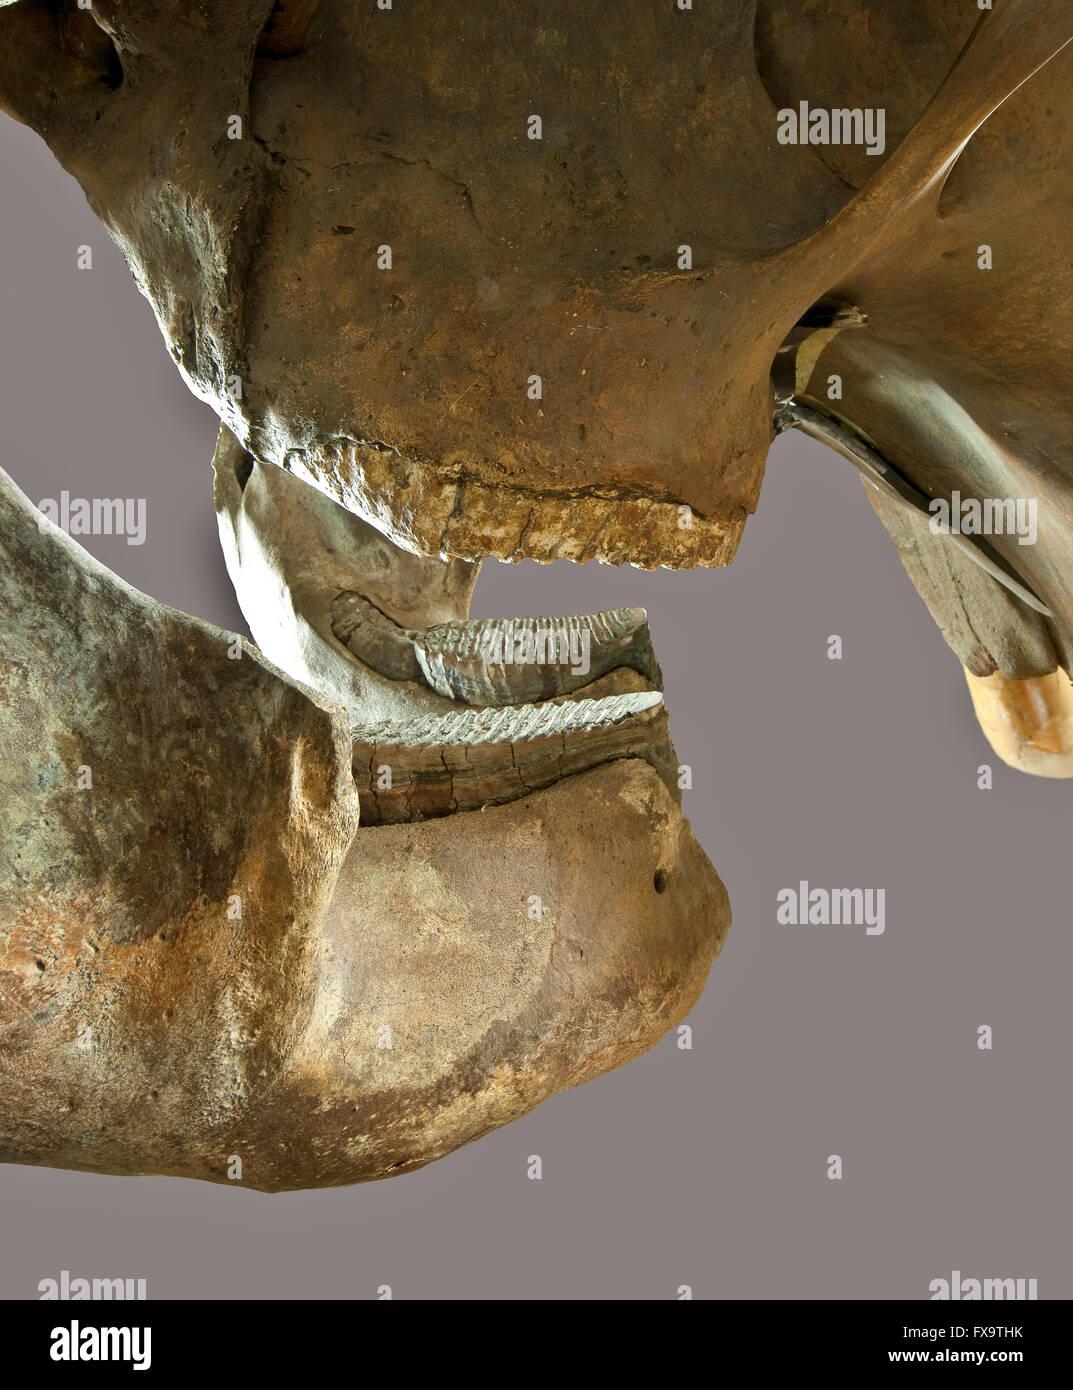 Mammoth's teeth - Stock Image